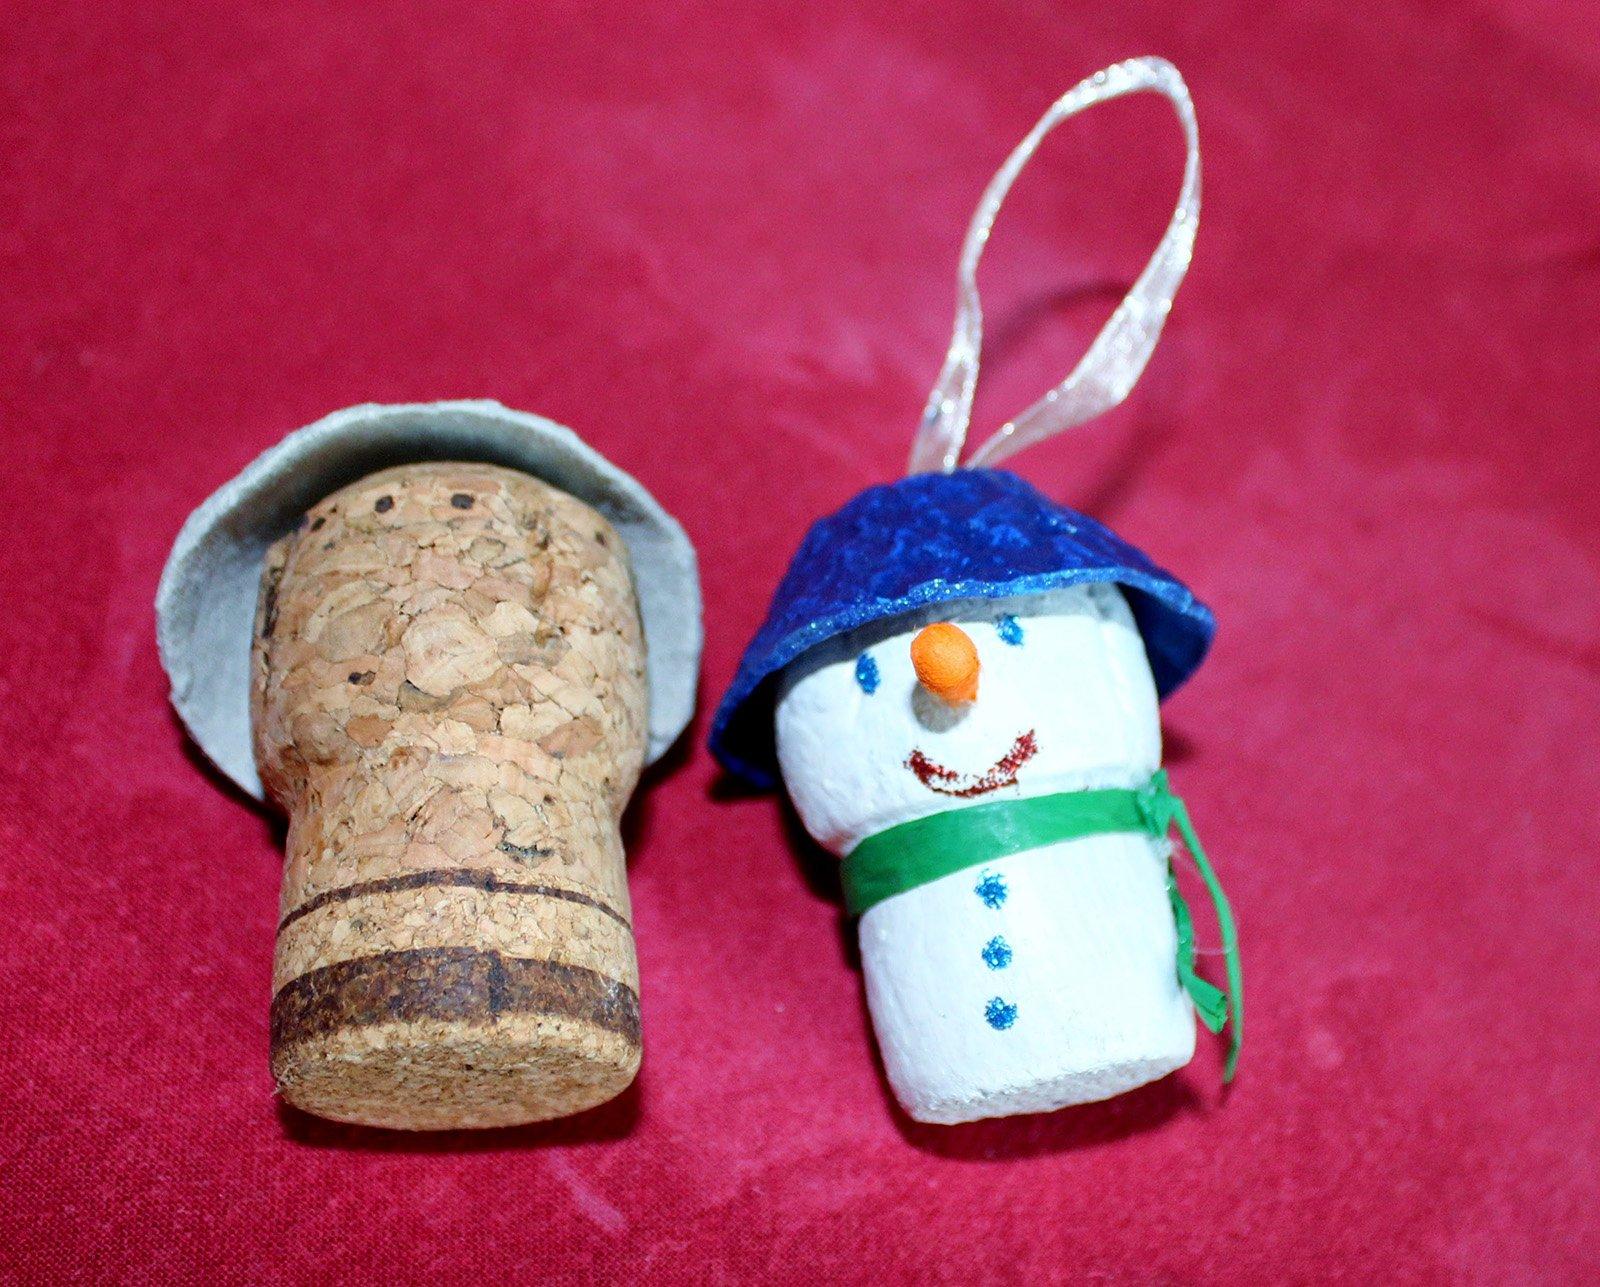 Decorazioni natalizie mini addobbi fai da te per l 39 albero for Cose di casa fai da te